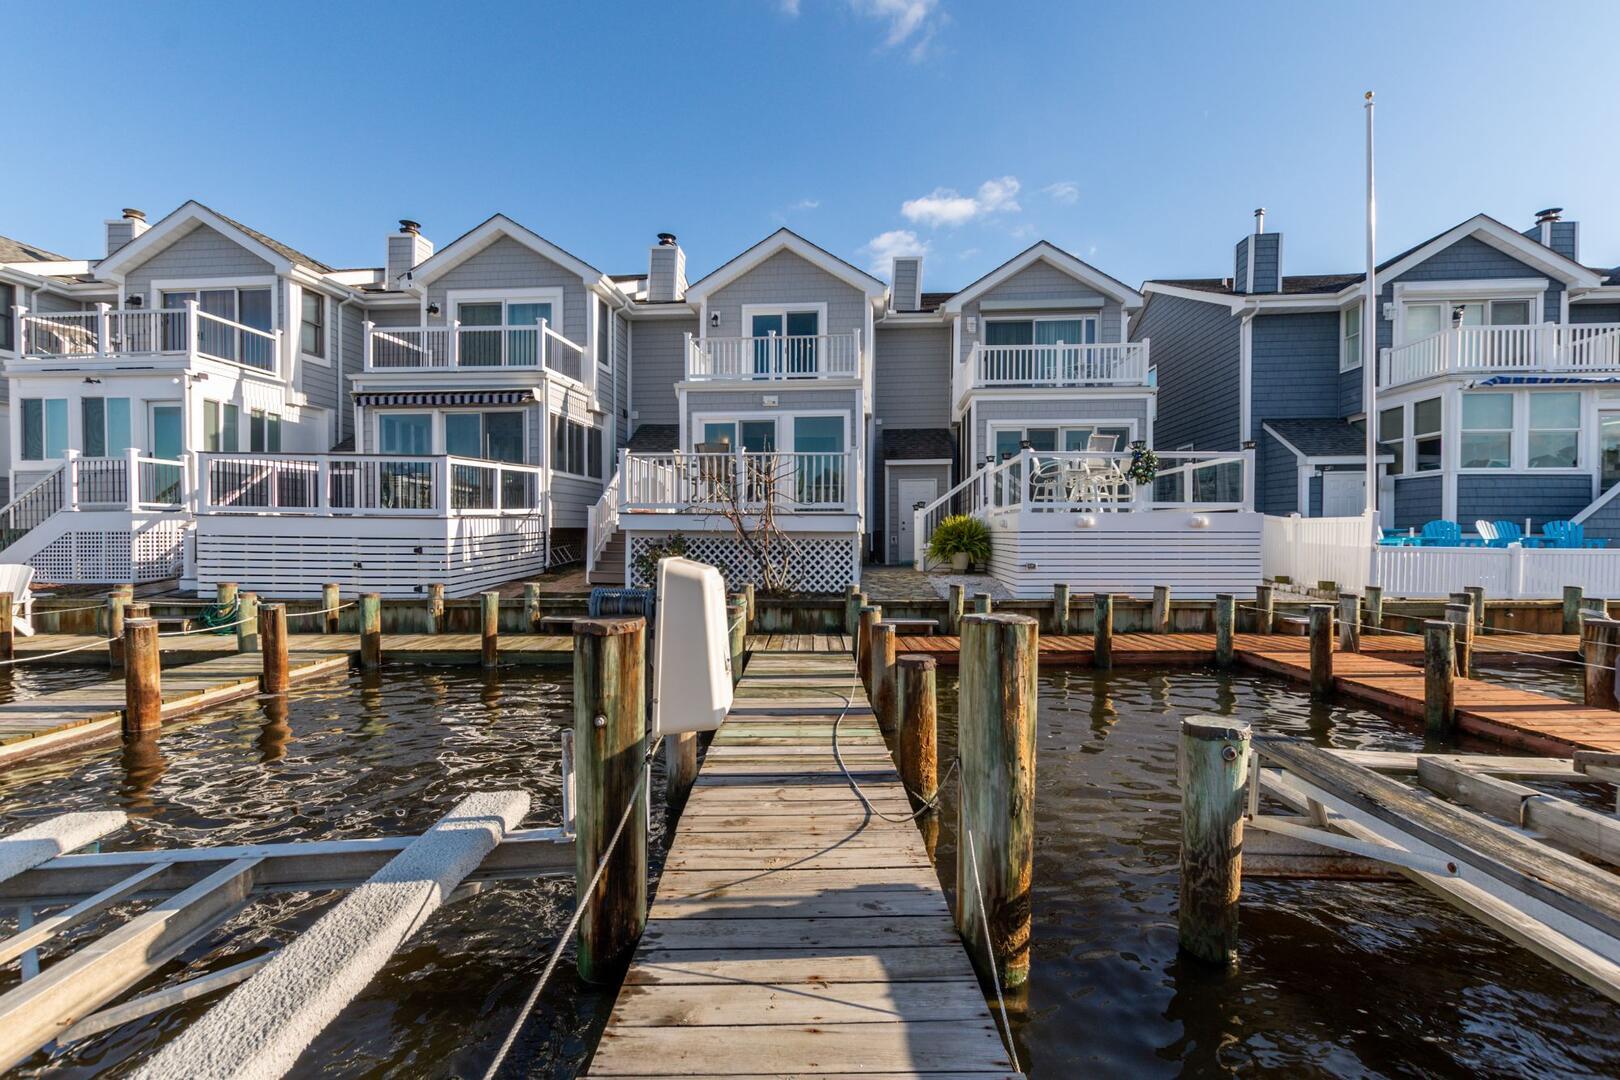 Exterior/Dock of Sunset Harbour 14127B